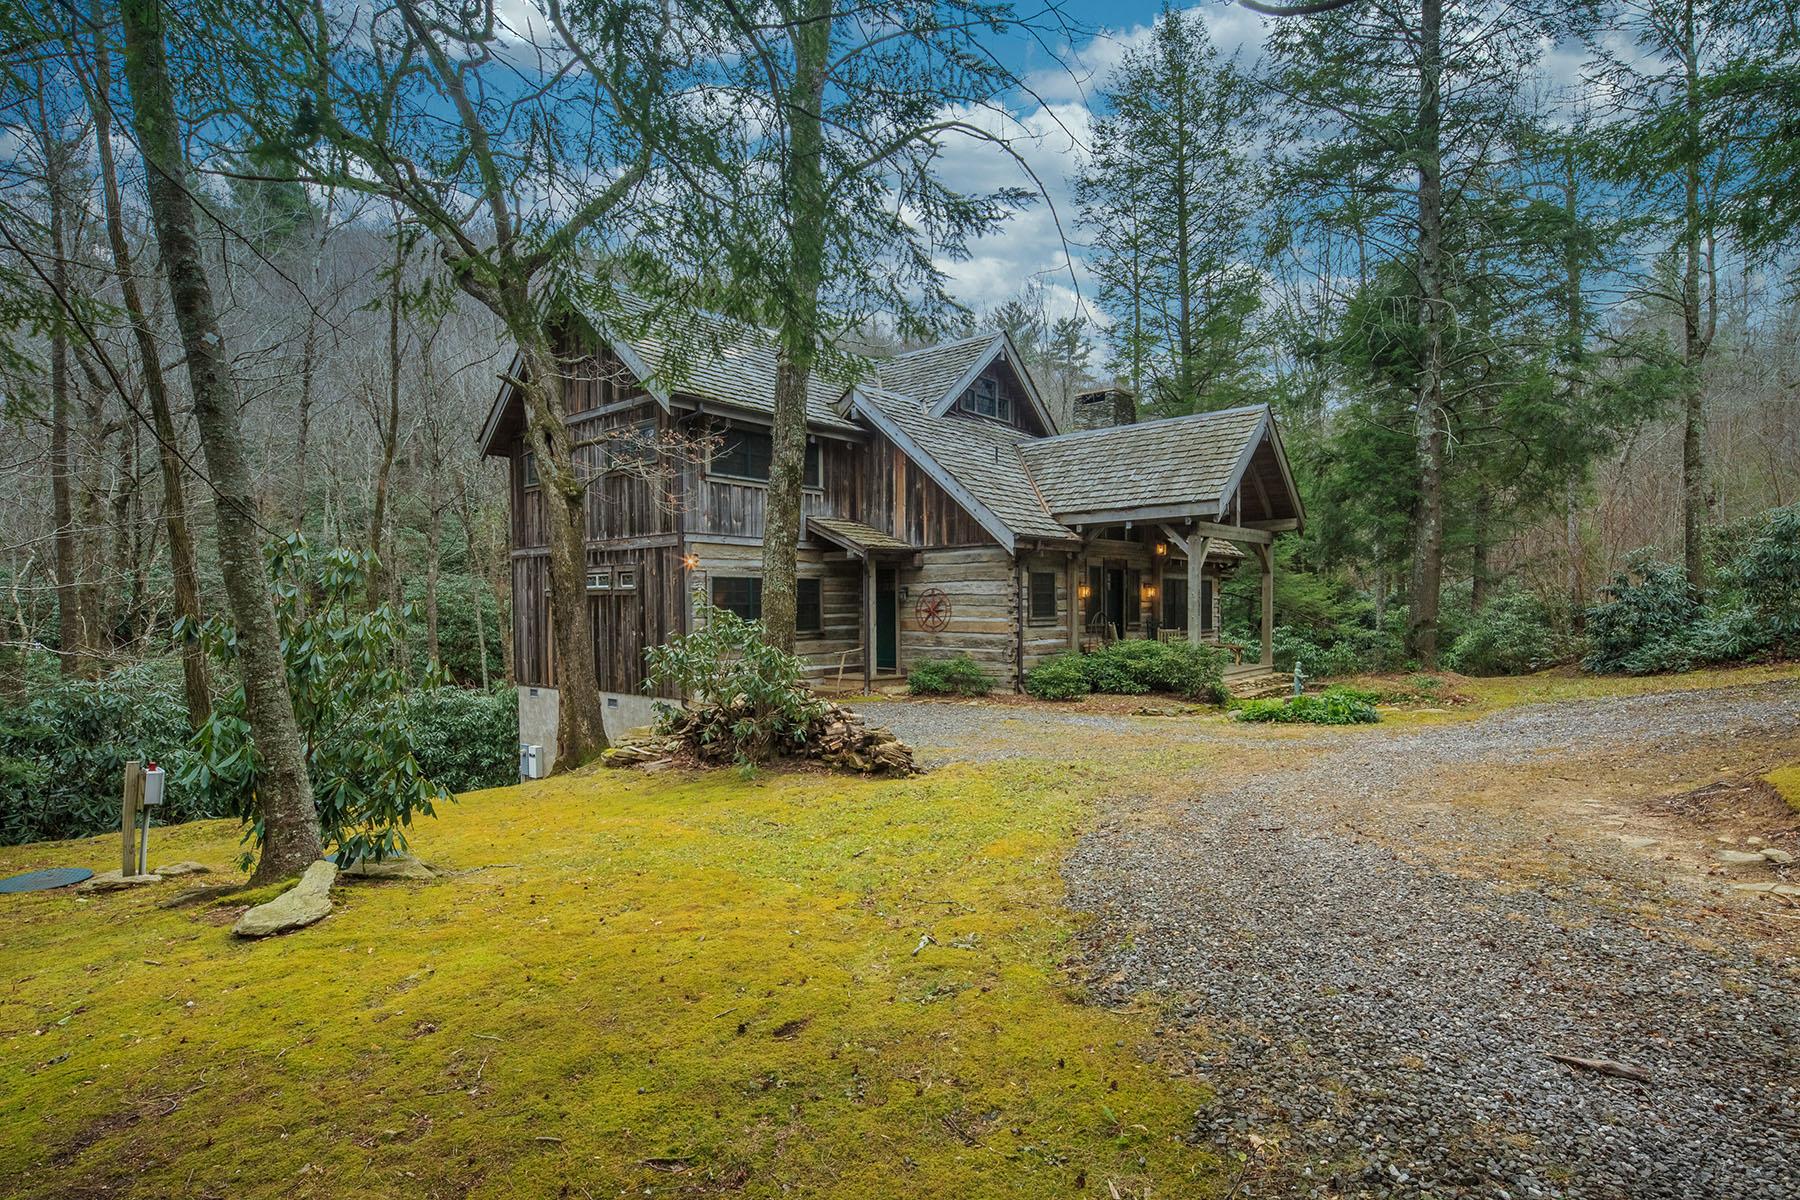 Single Family Homes for Sale at JONAS RIDGE - UPPER CREEK ACRES 6095 Carolyn Ct Newland, North Carolina 28657 United States